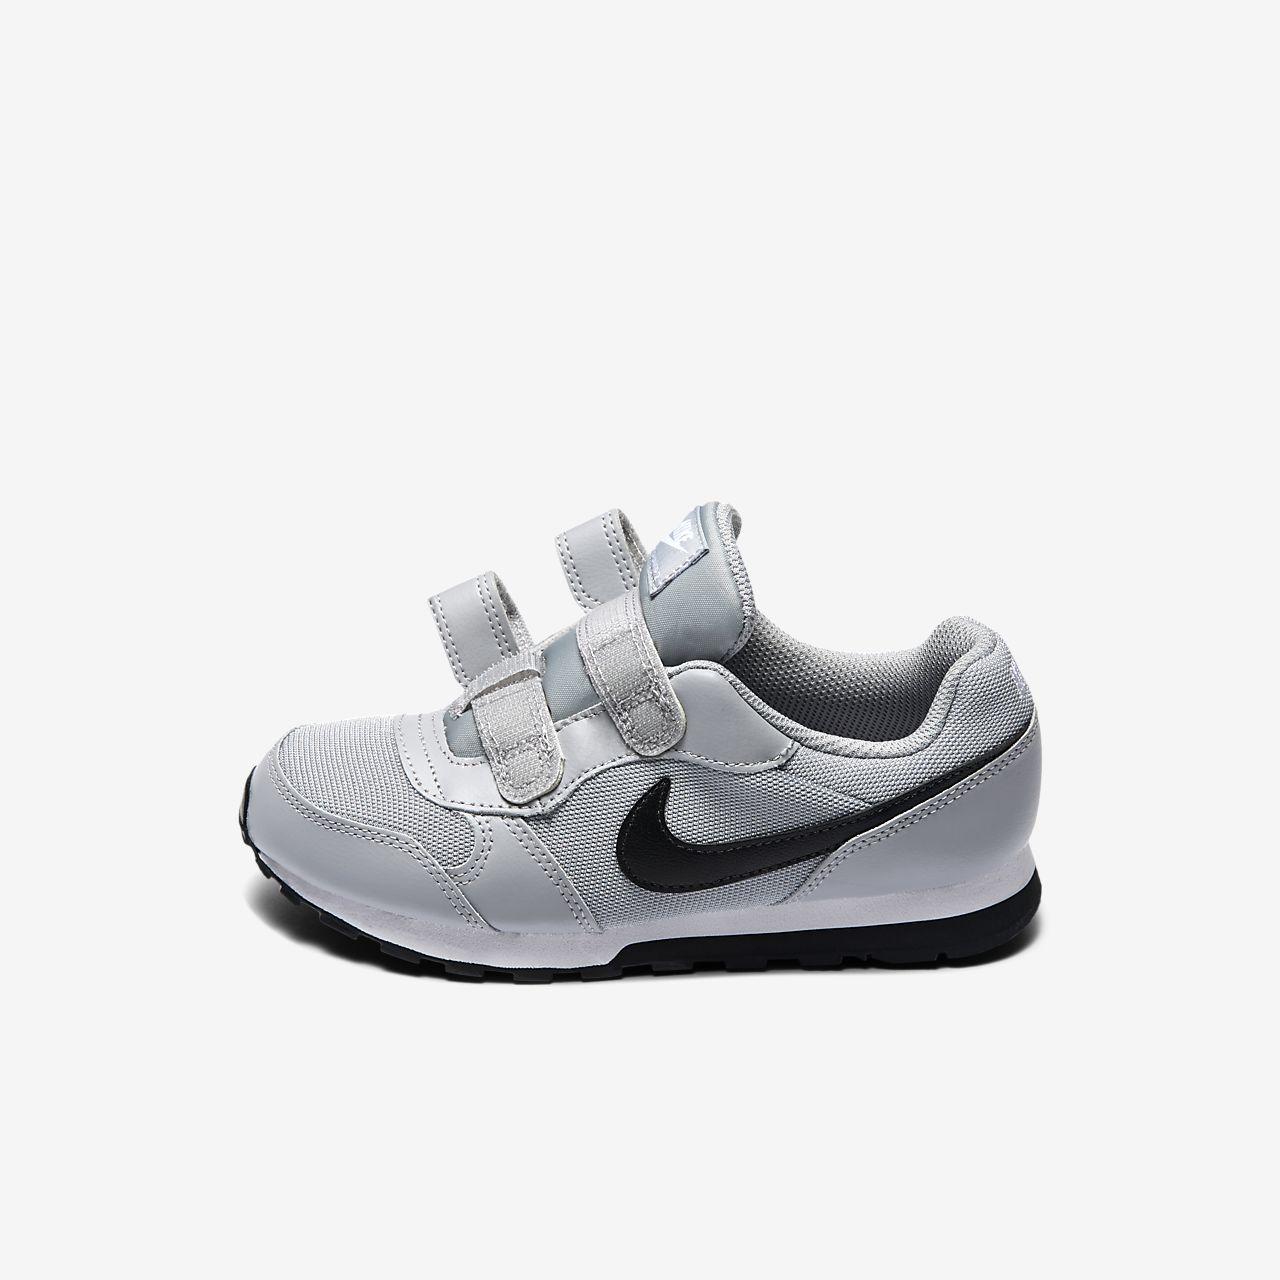 a33847af640363 Nike MD Runner 2 Younger Kids  Shoe. Nike.com ID